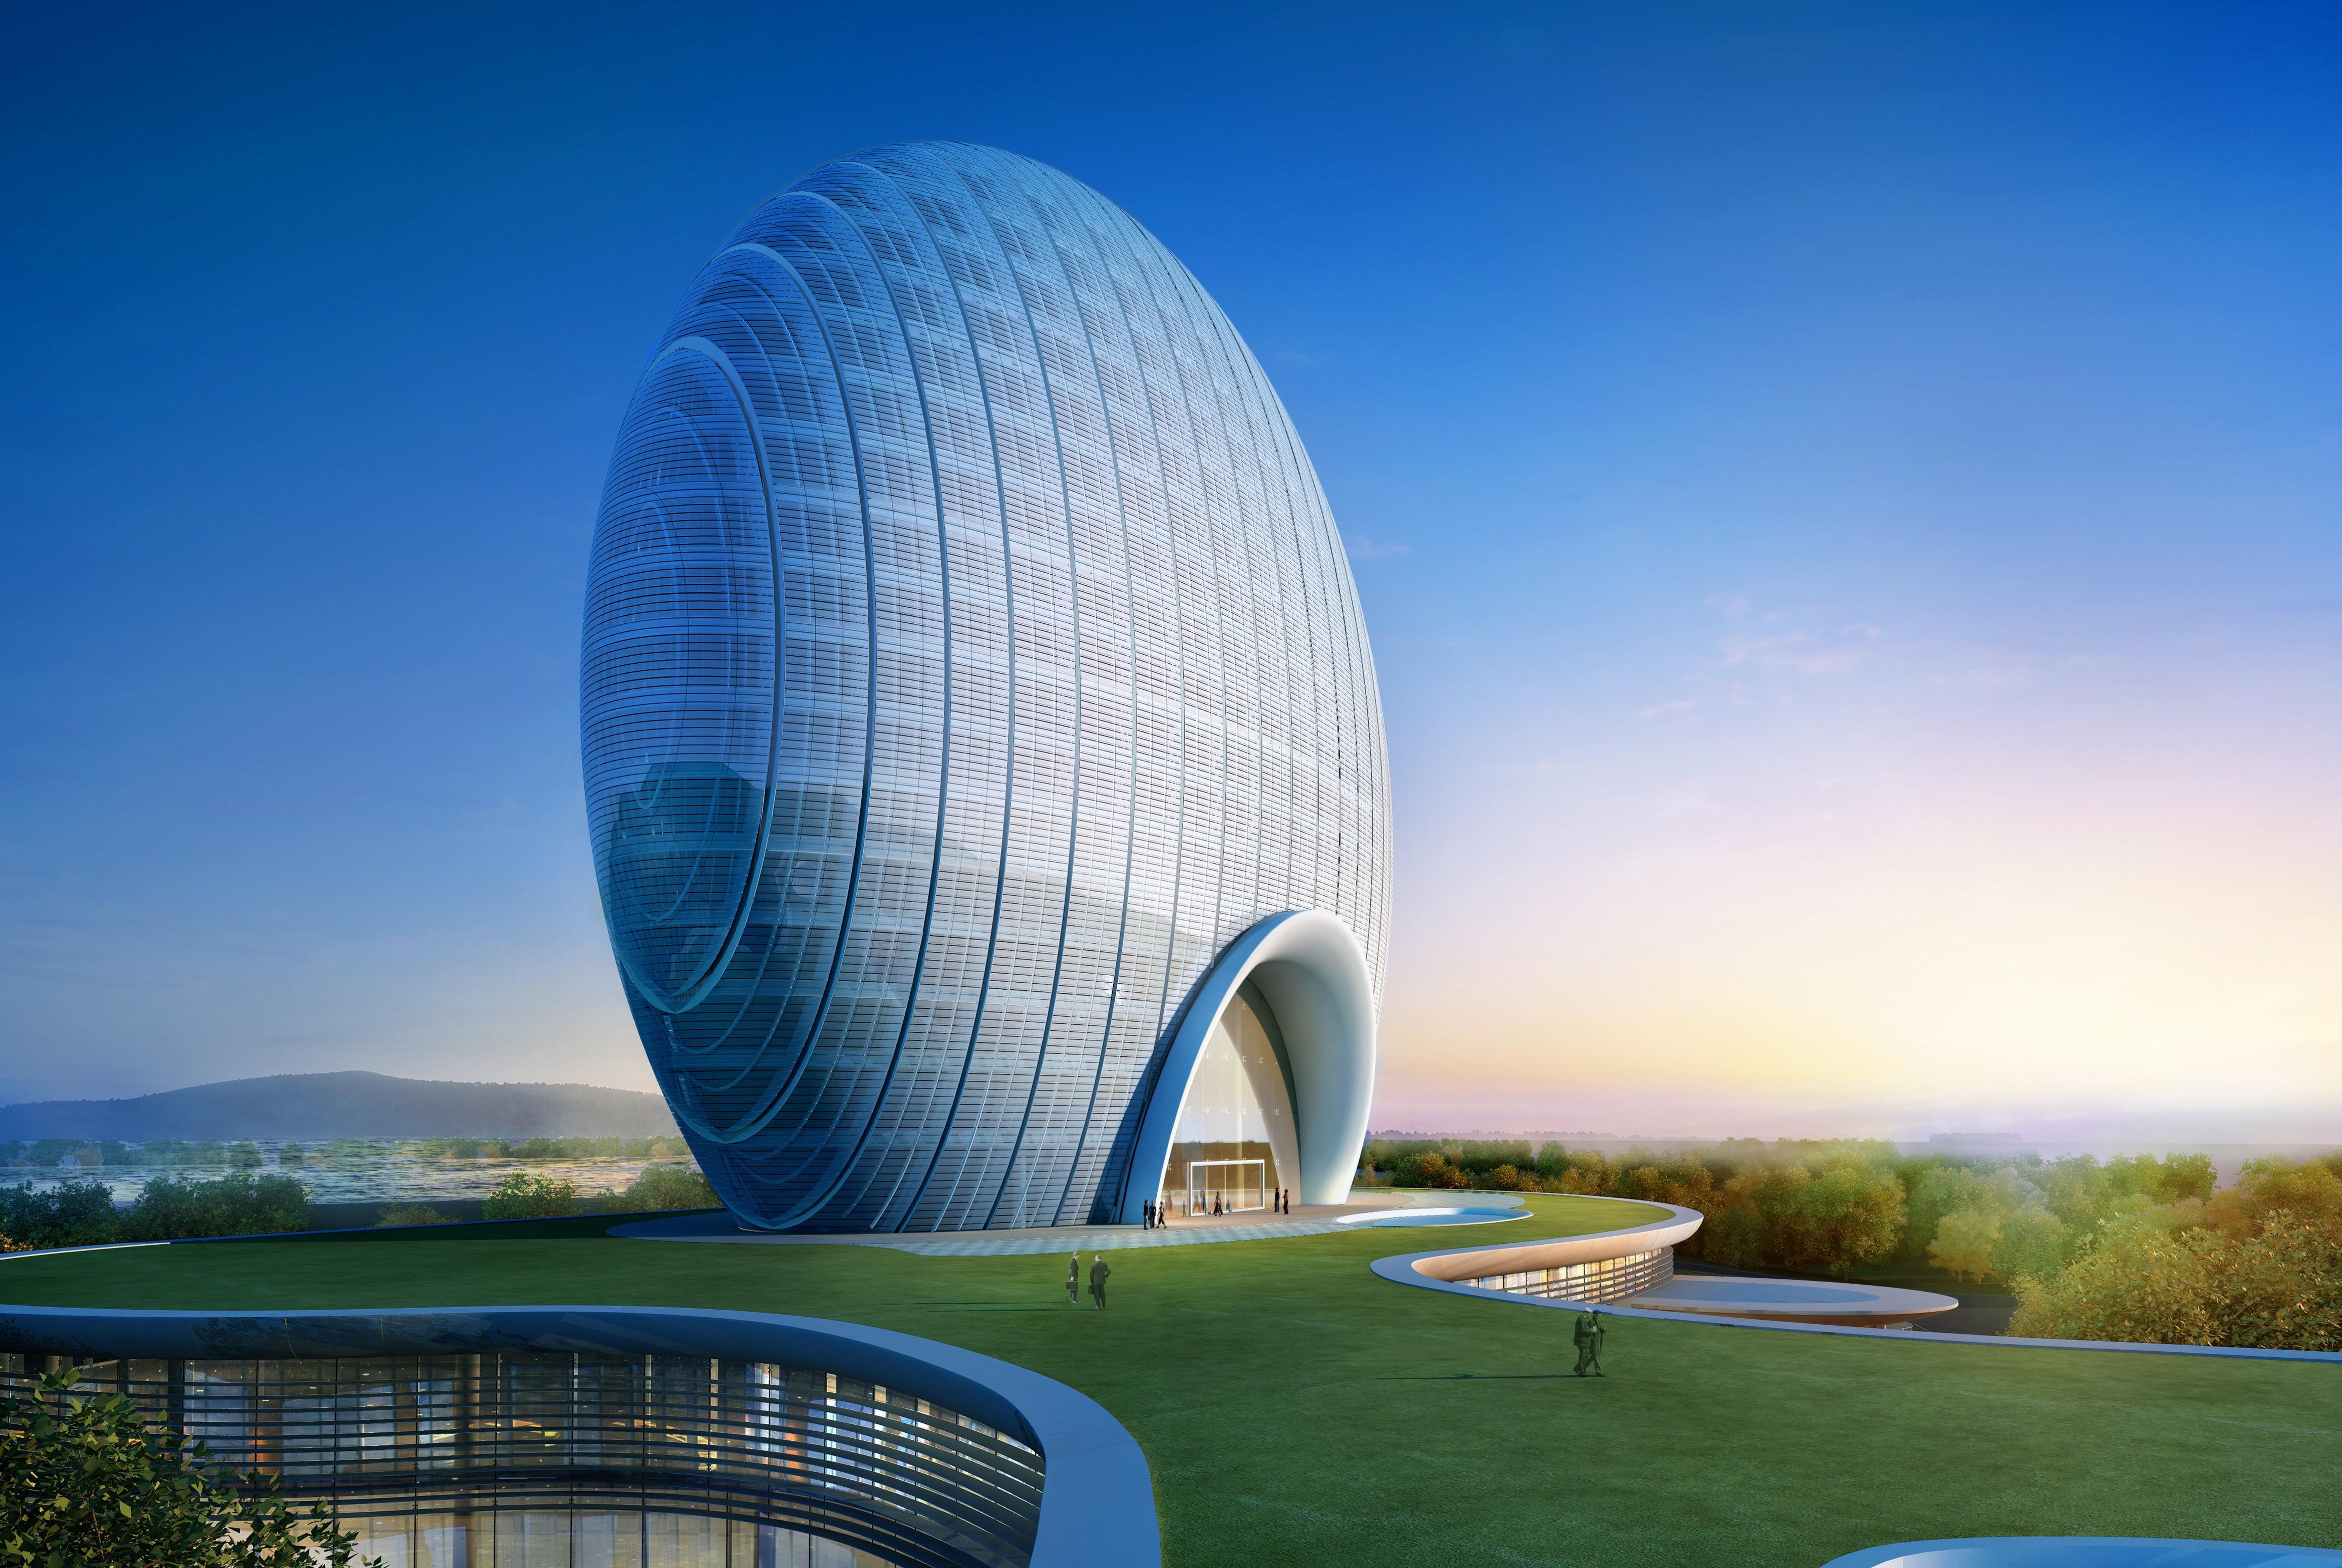 Spektakuläre rchitektur: Neues Kempinski Hotel in Peking eröffnet ... size: 4677 x 3132 post ID: 9 File size: 0 B